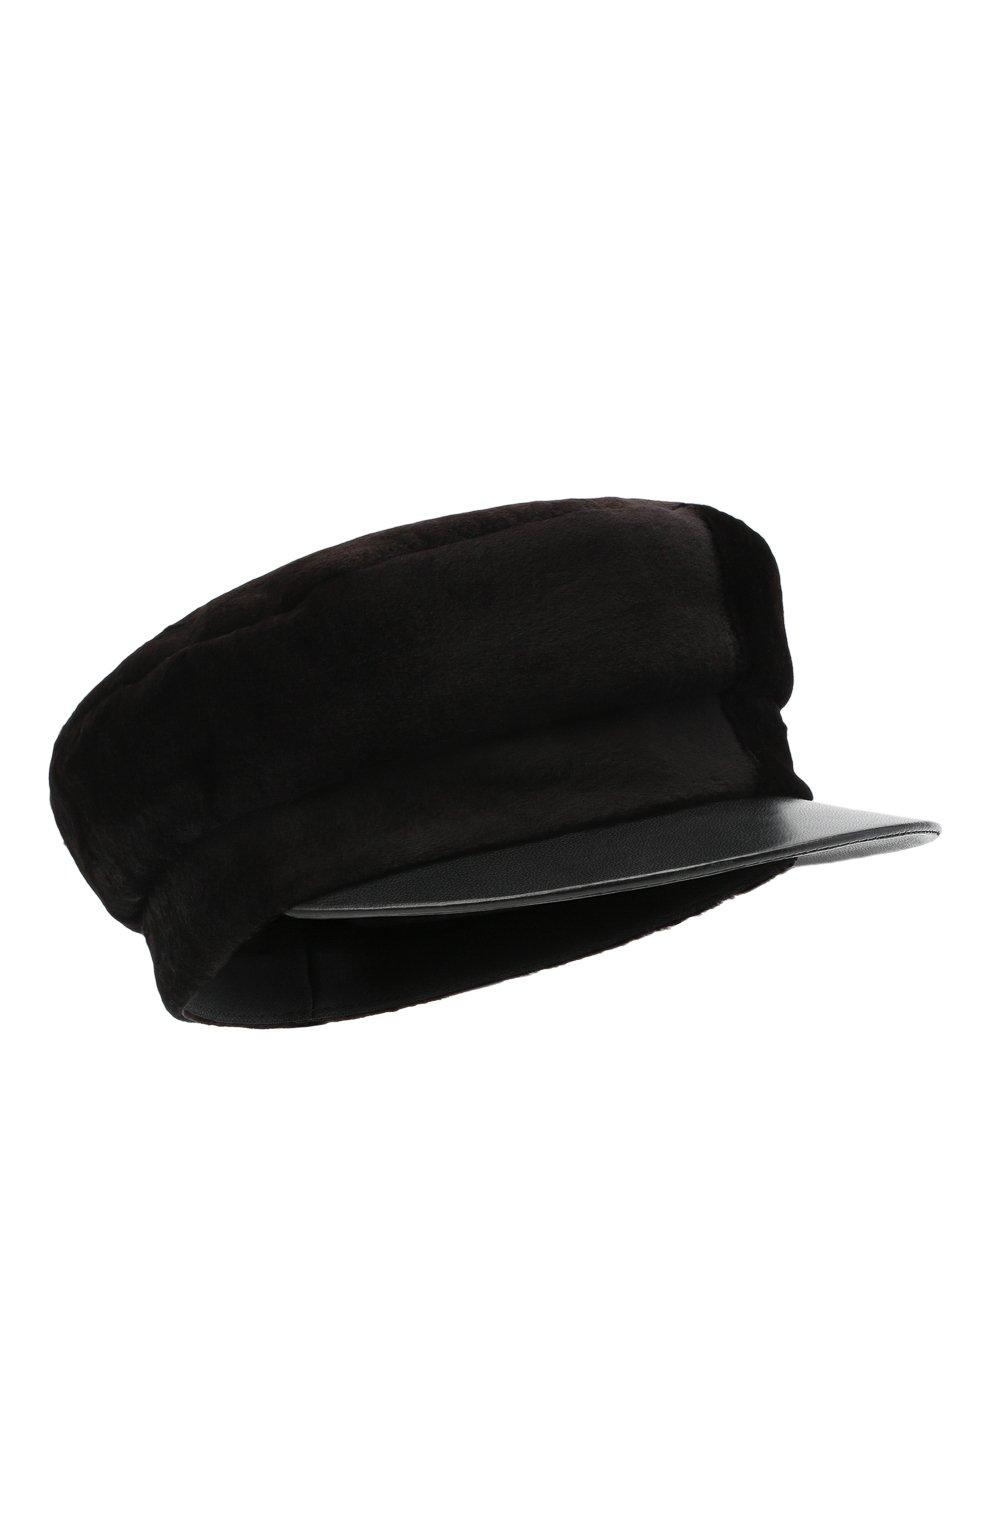 Женская кепка из меха норки KUSSENKOVV темно-коричневого цвета, арт. 120218504426 | Фото 1